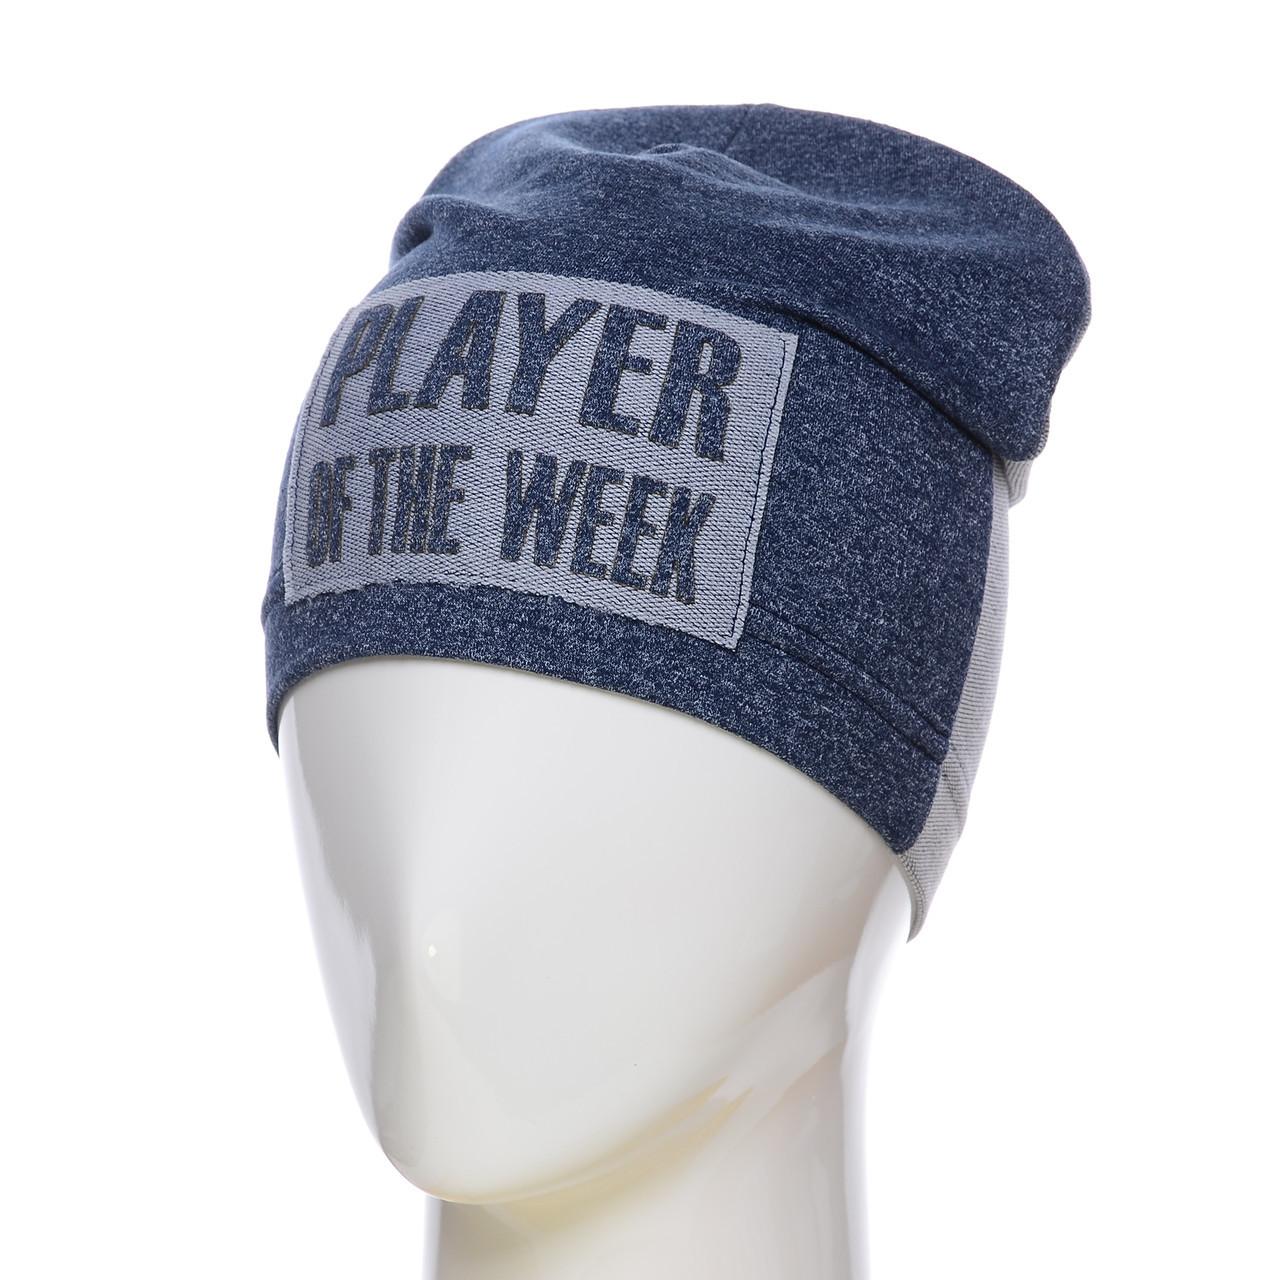 "Двухцвеная шапка ""Player of the week"""